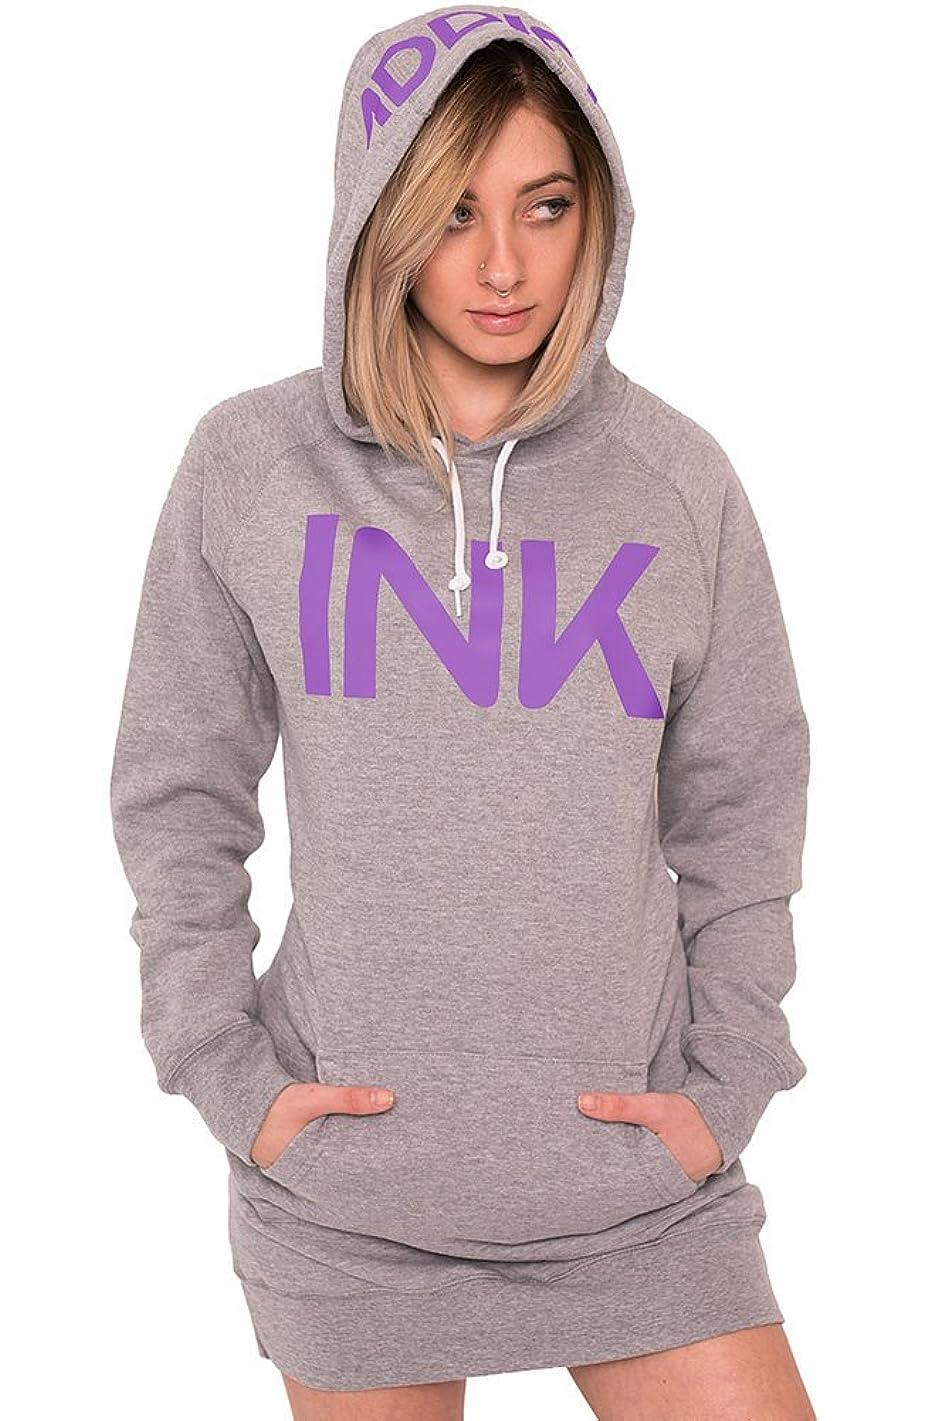 Ink Women's Heather Grey Pullover Hoodie Dress by InkAddict